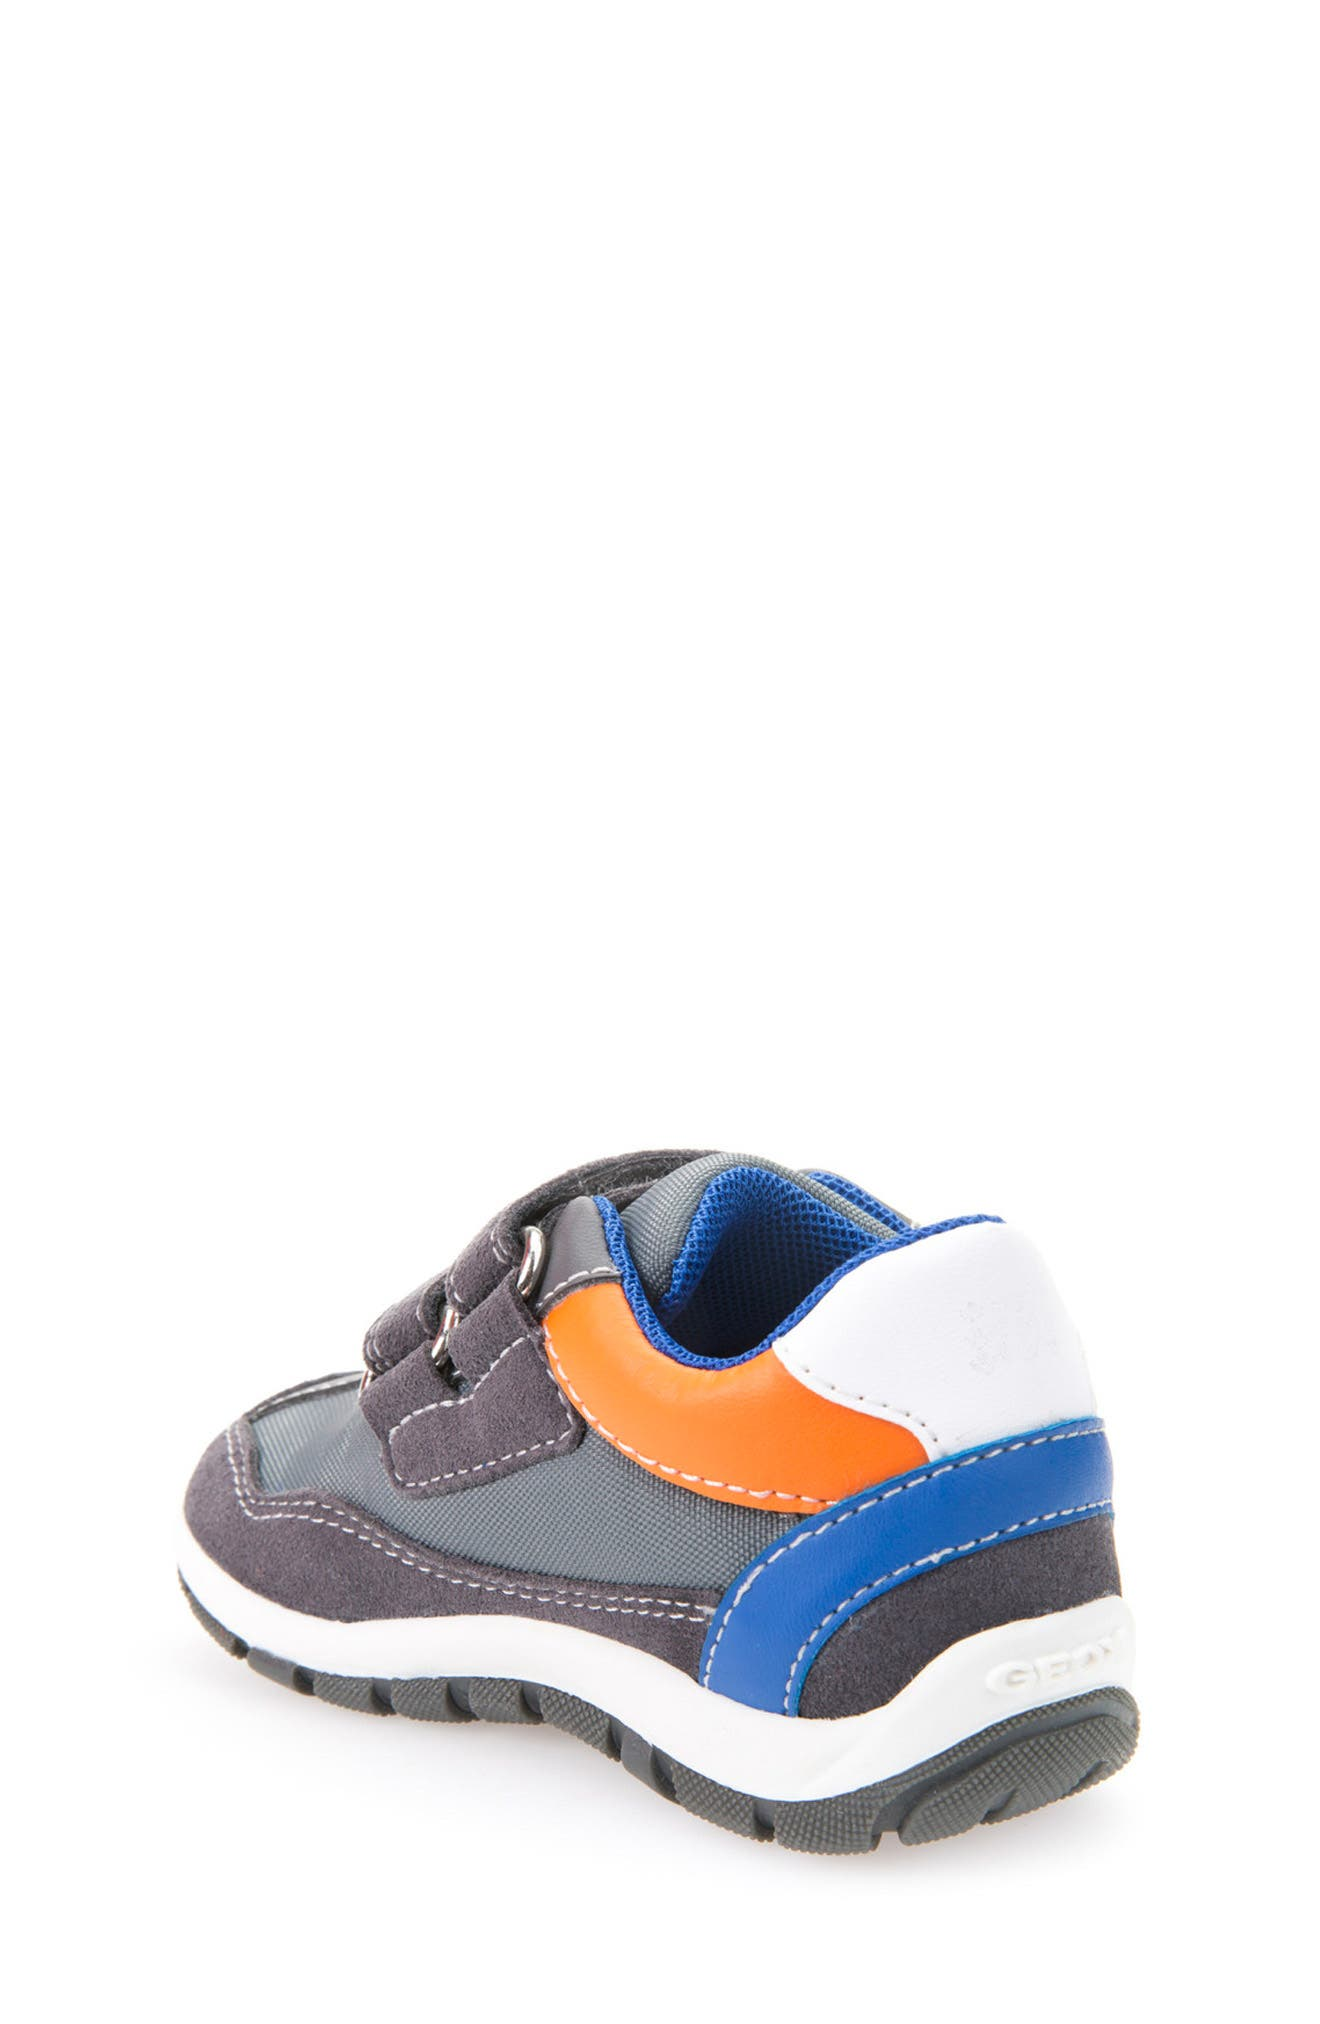 Shaax Sneaker,                             Alternate thumbnail 2, color,                             073